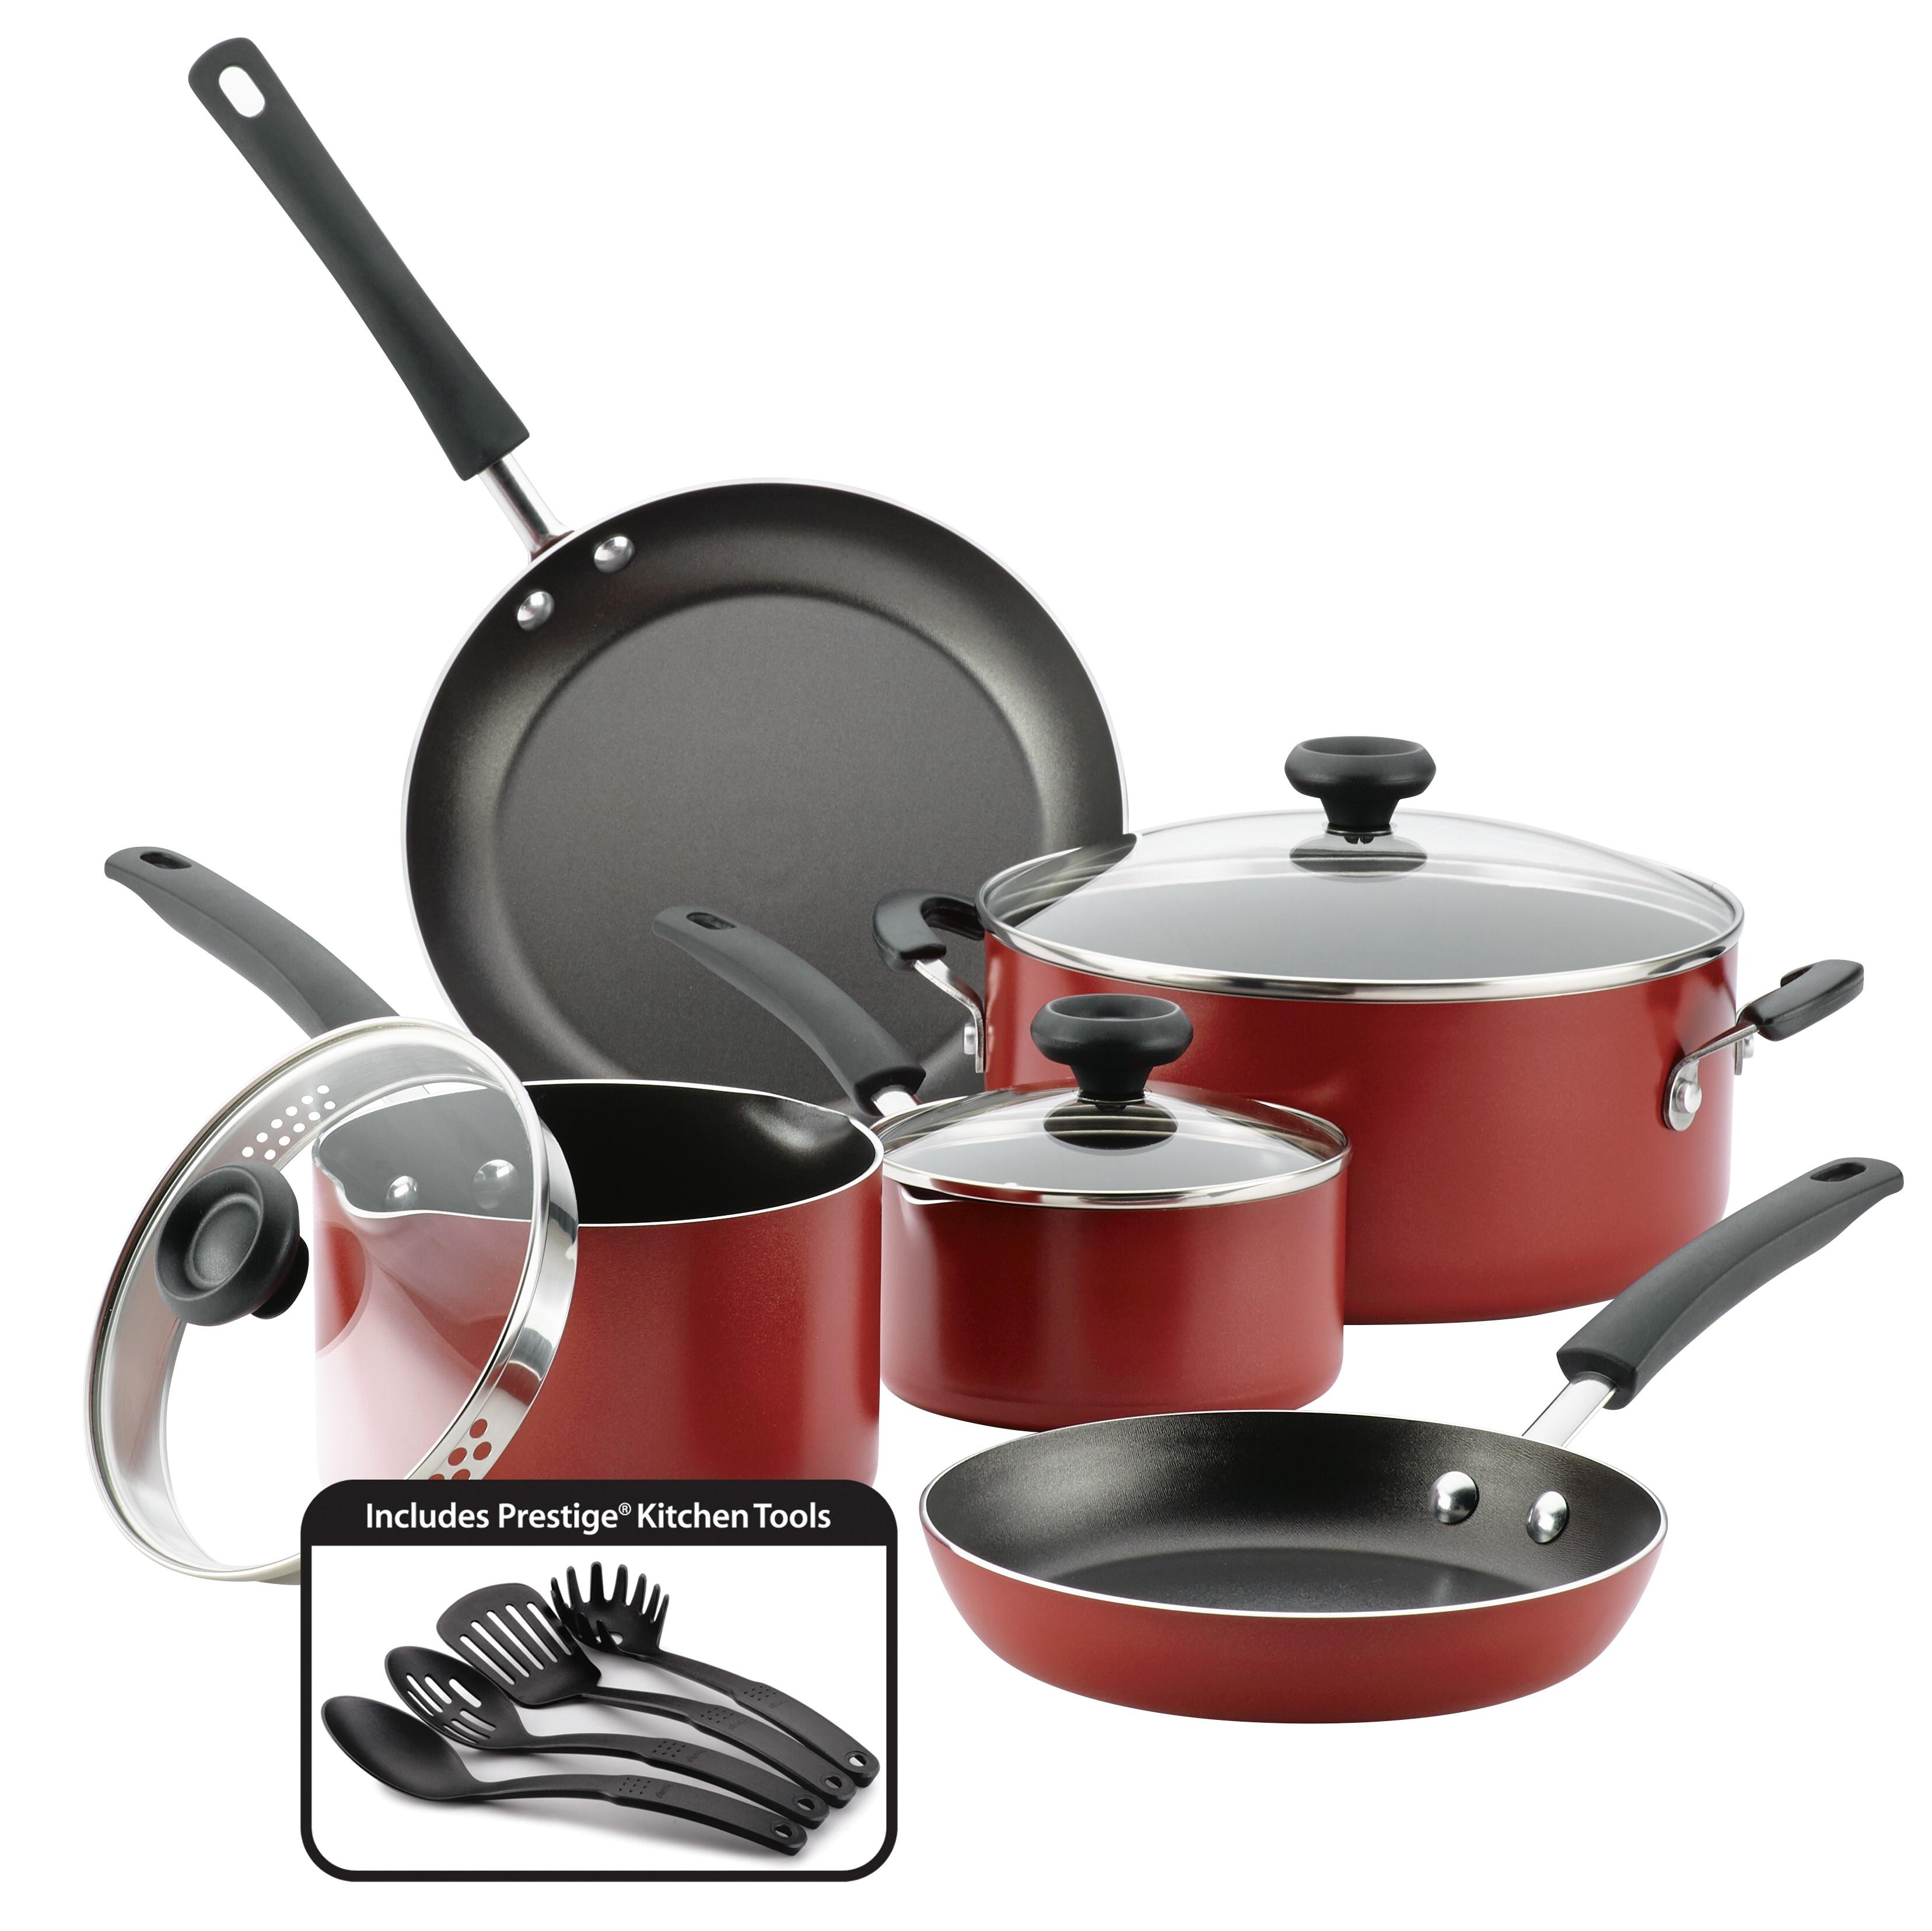 Farberware Easy Clean Aluminum Nonstick Cookware Set